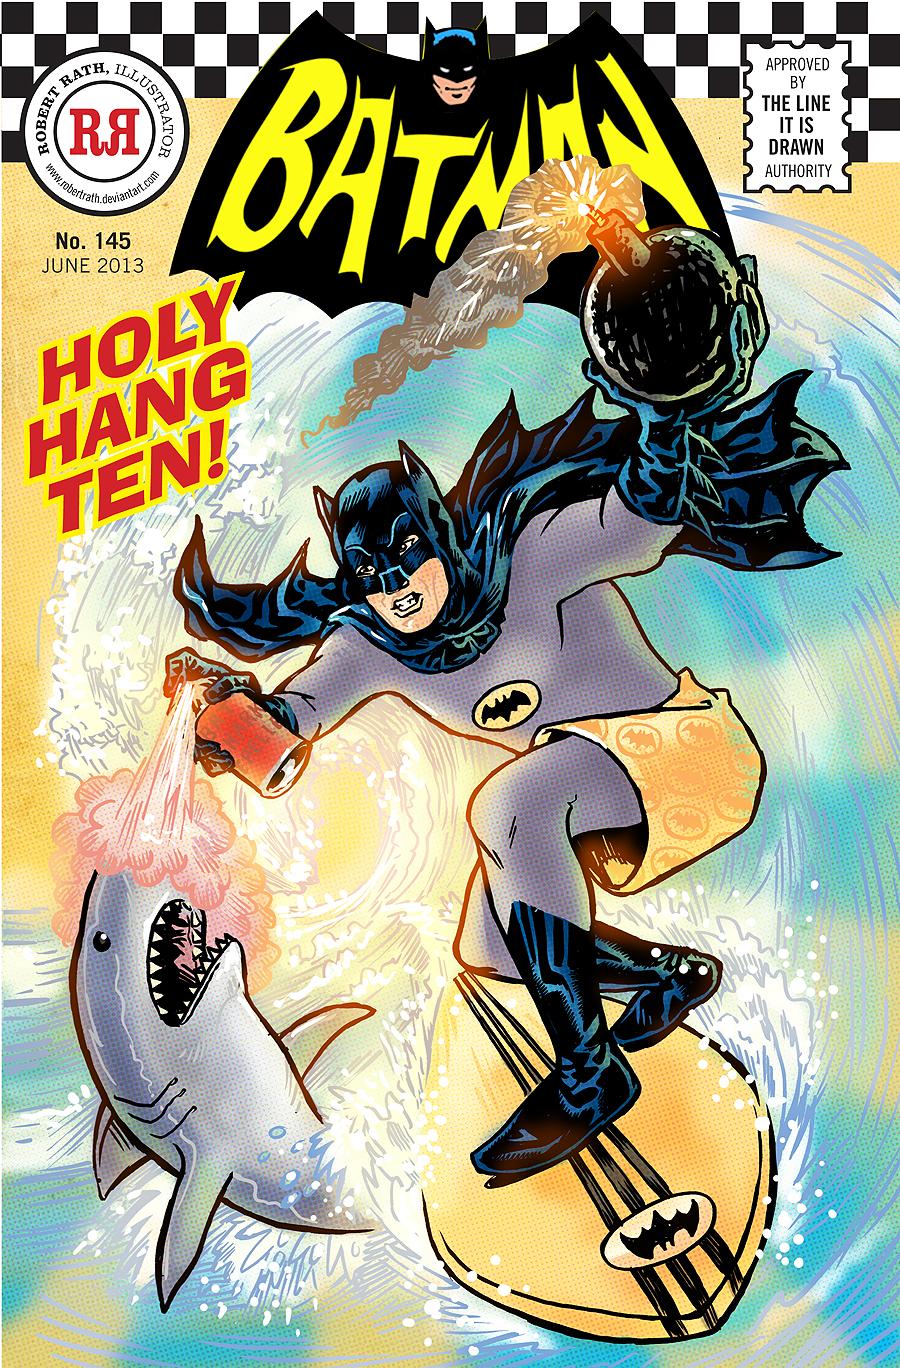 Holy Surf's Up, Batman!